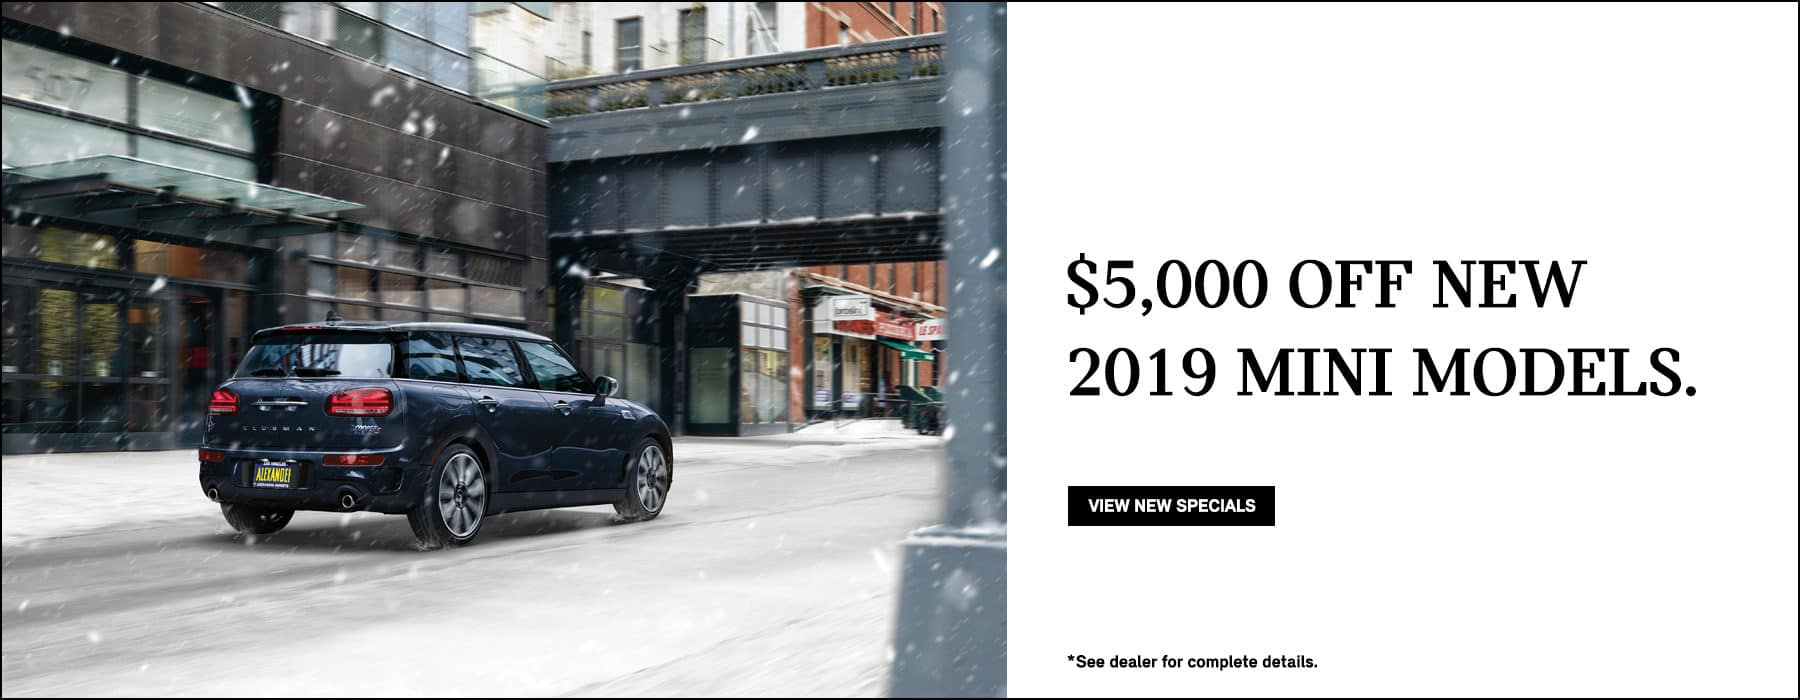 $5,000 off new 2019 MINI models.